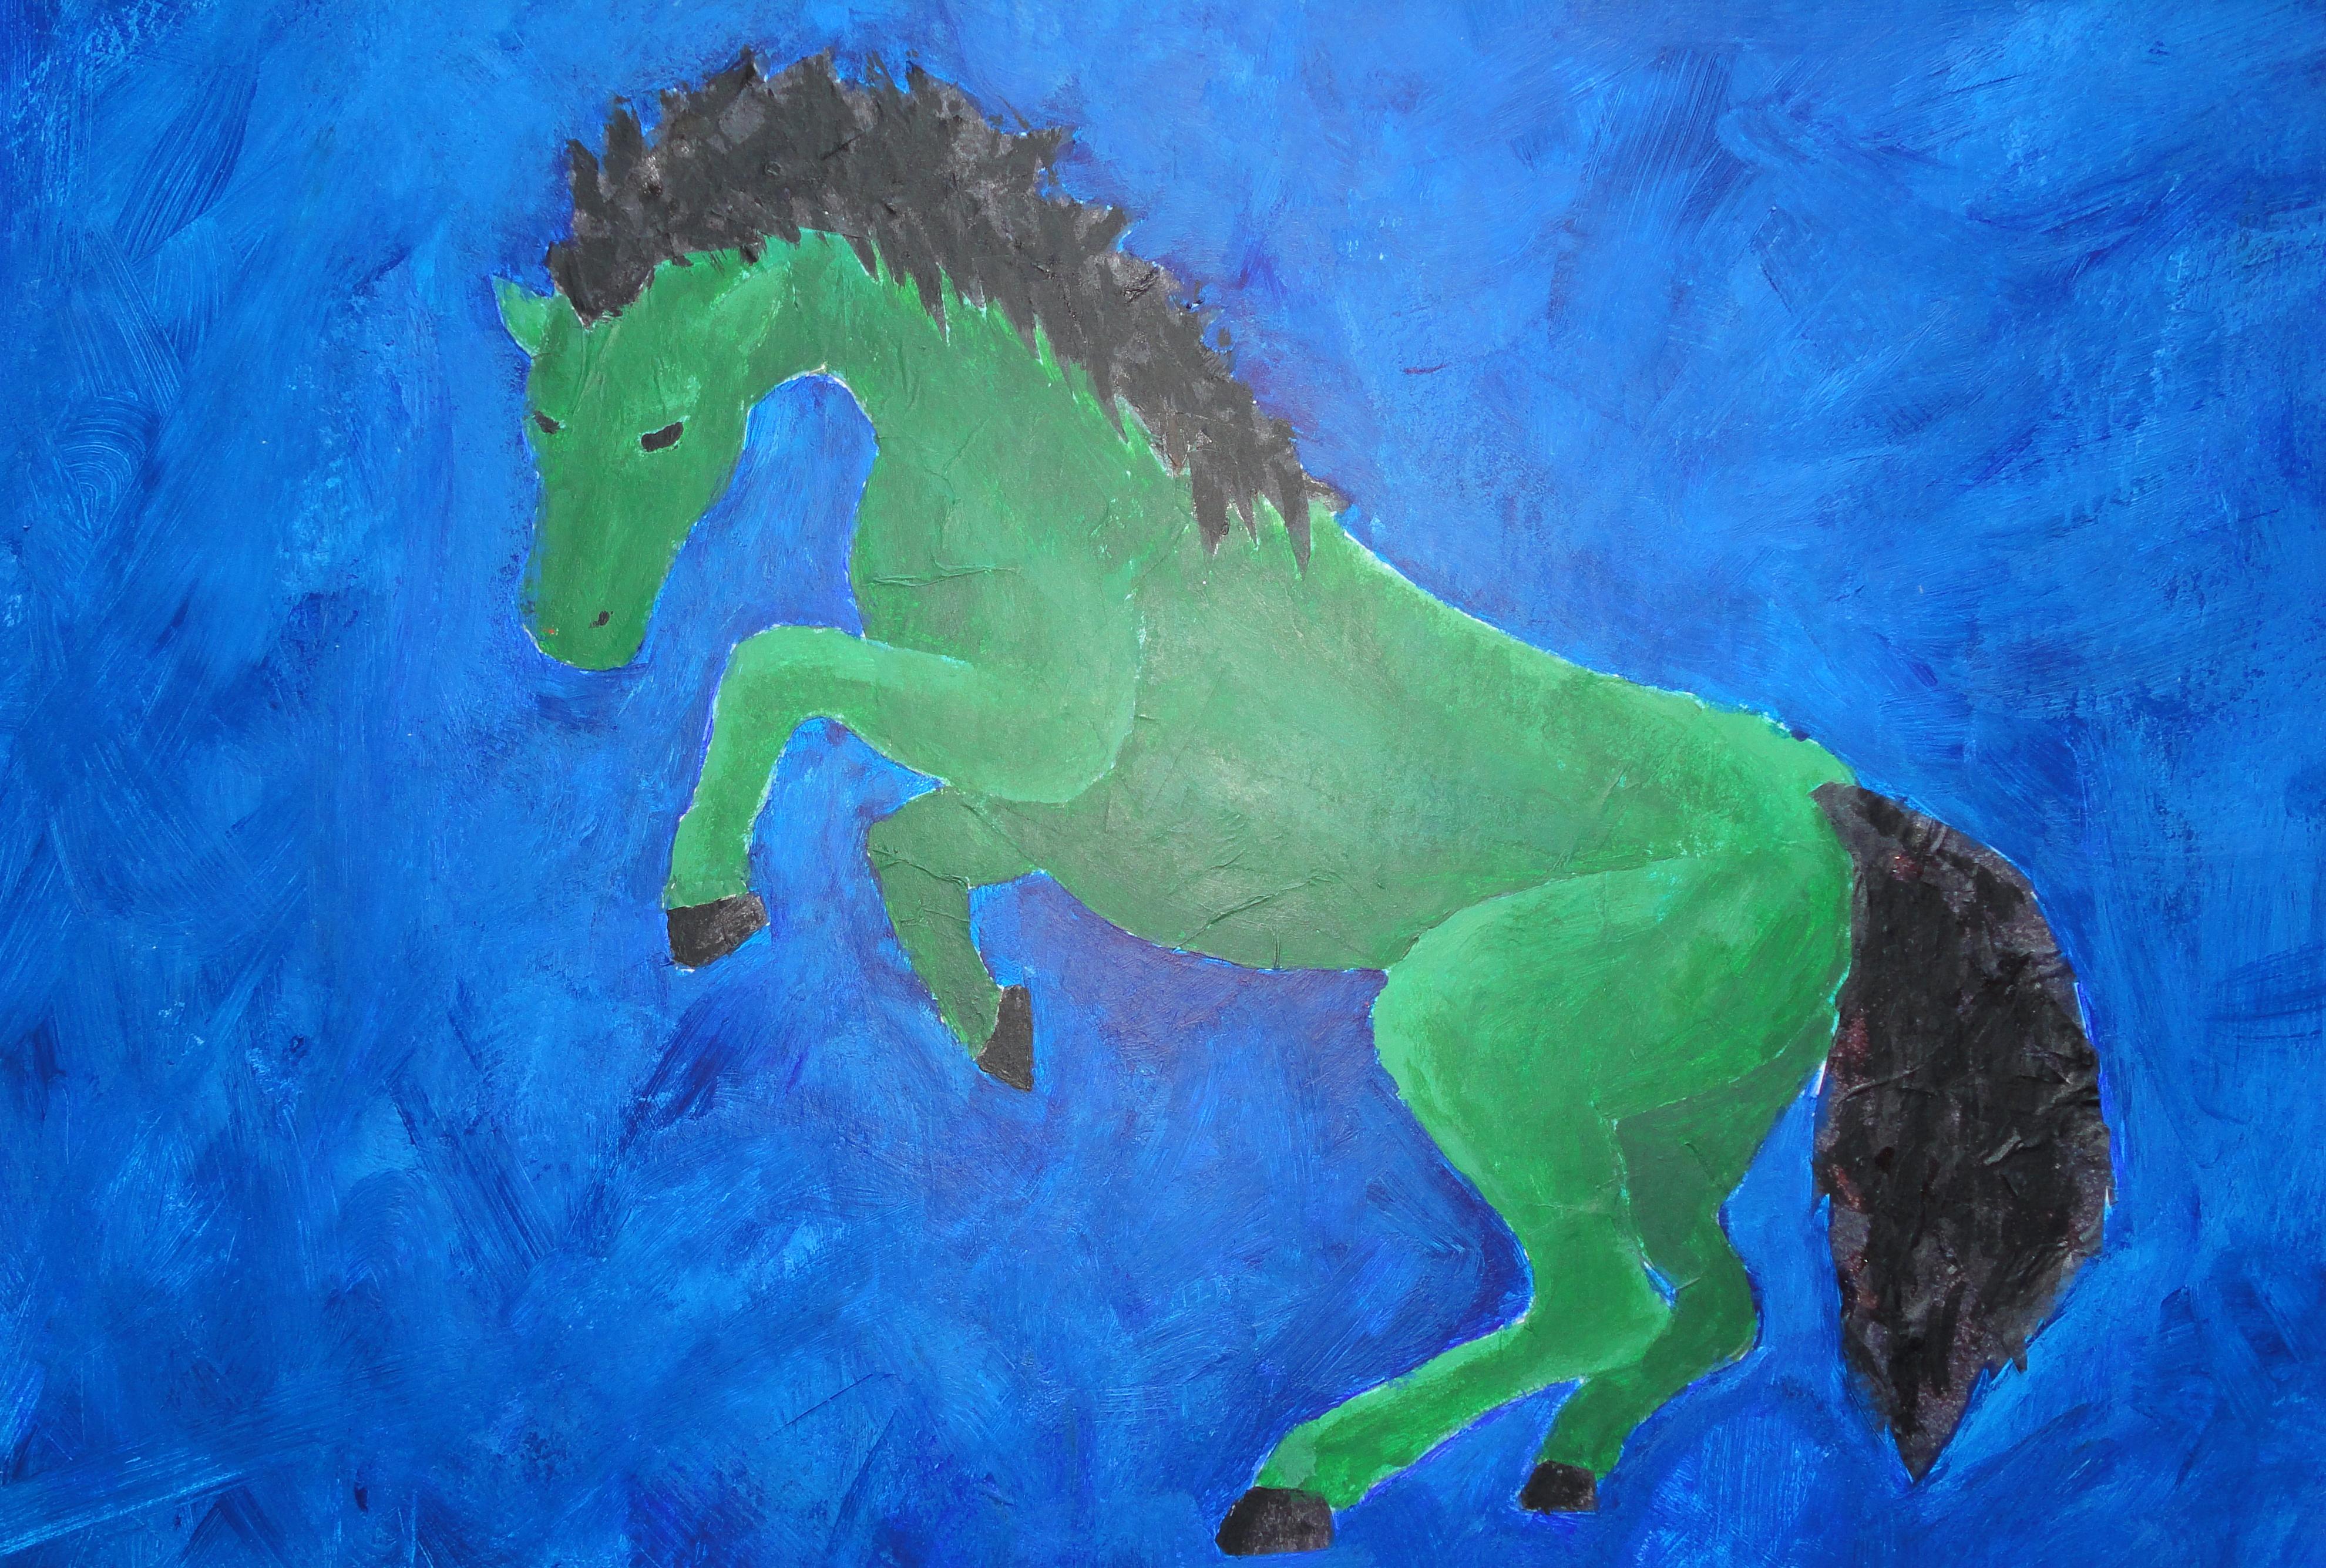 green horse